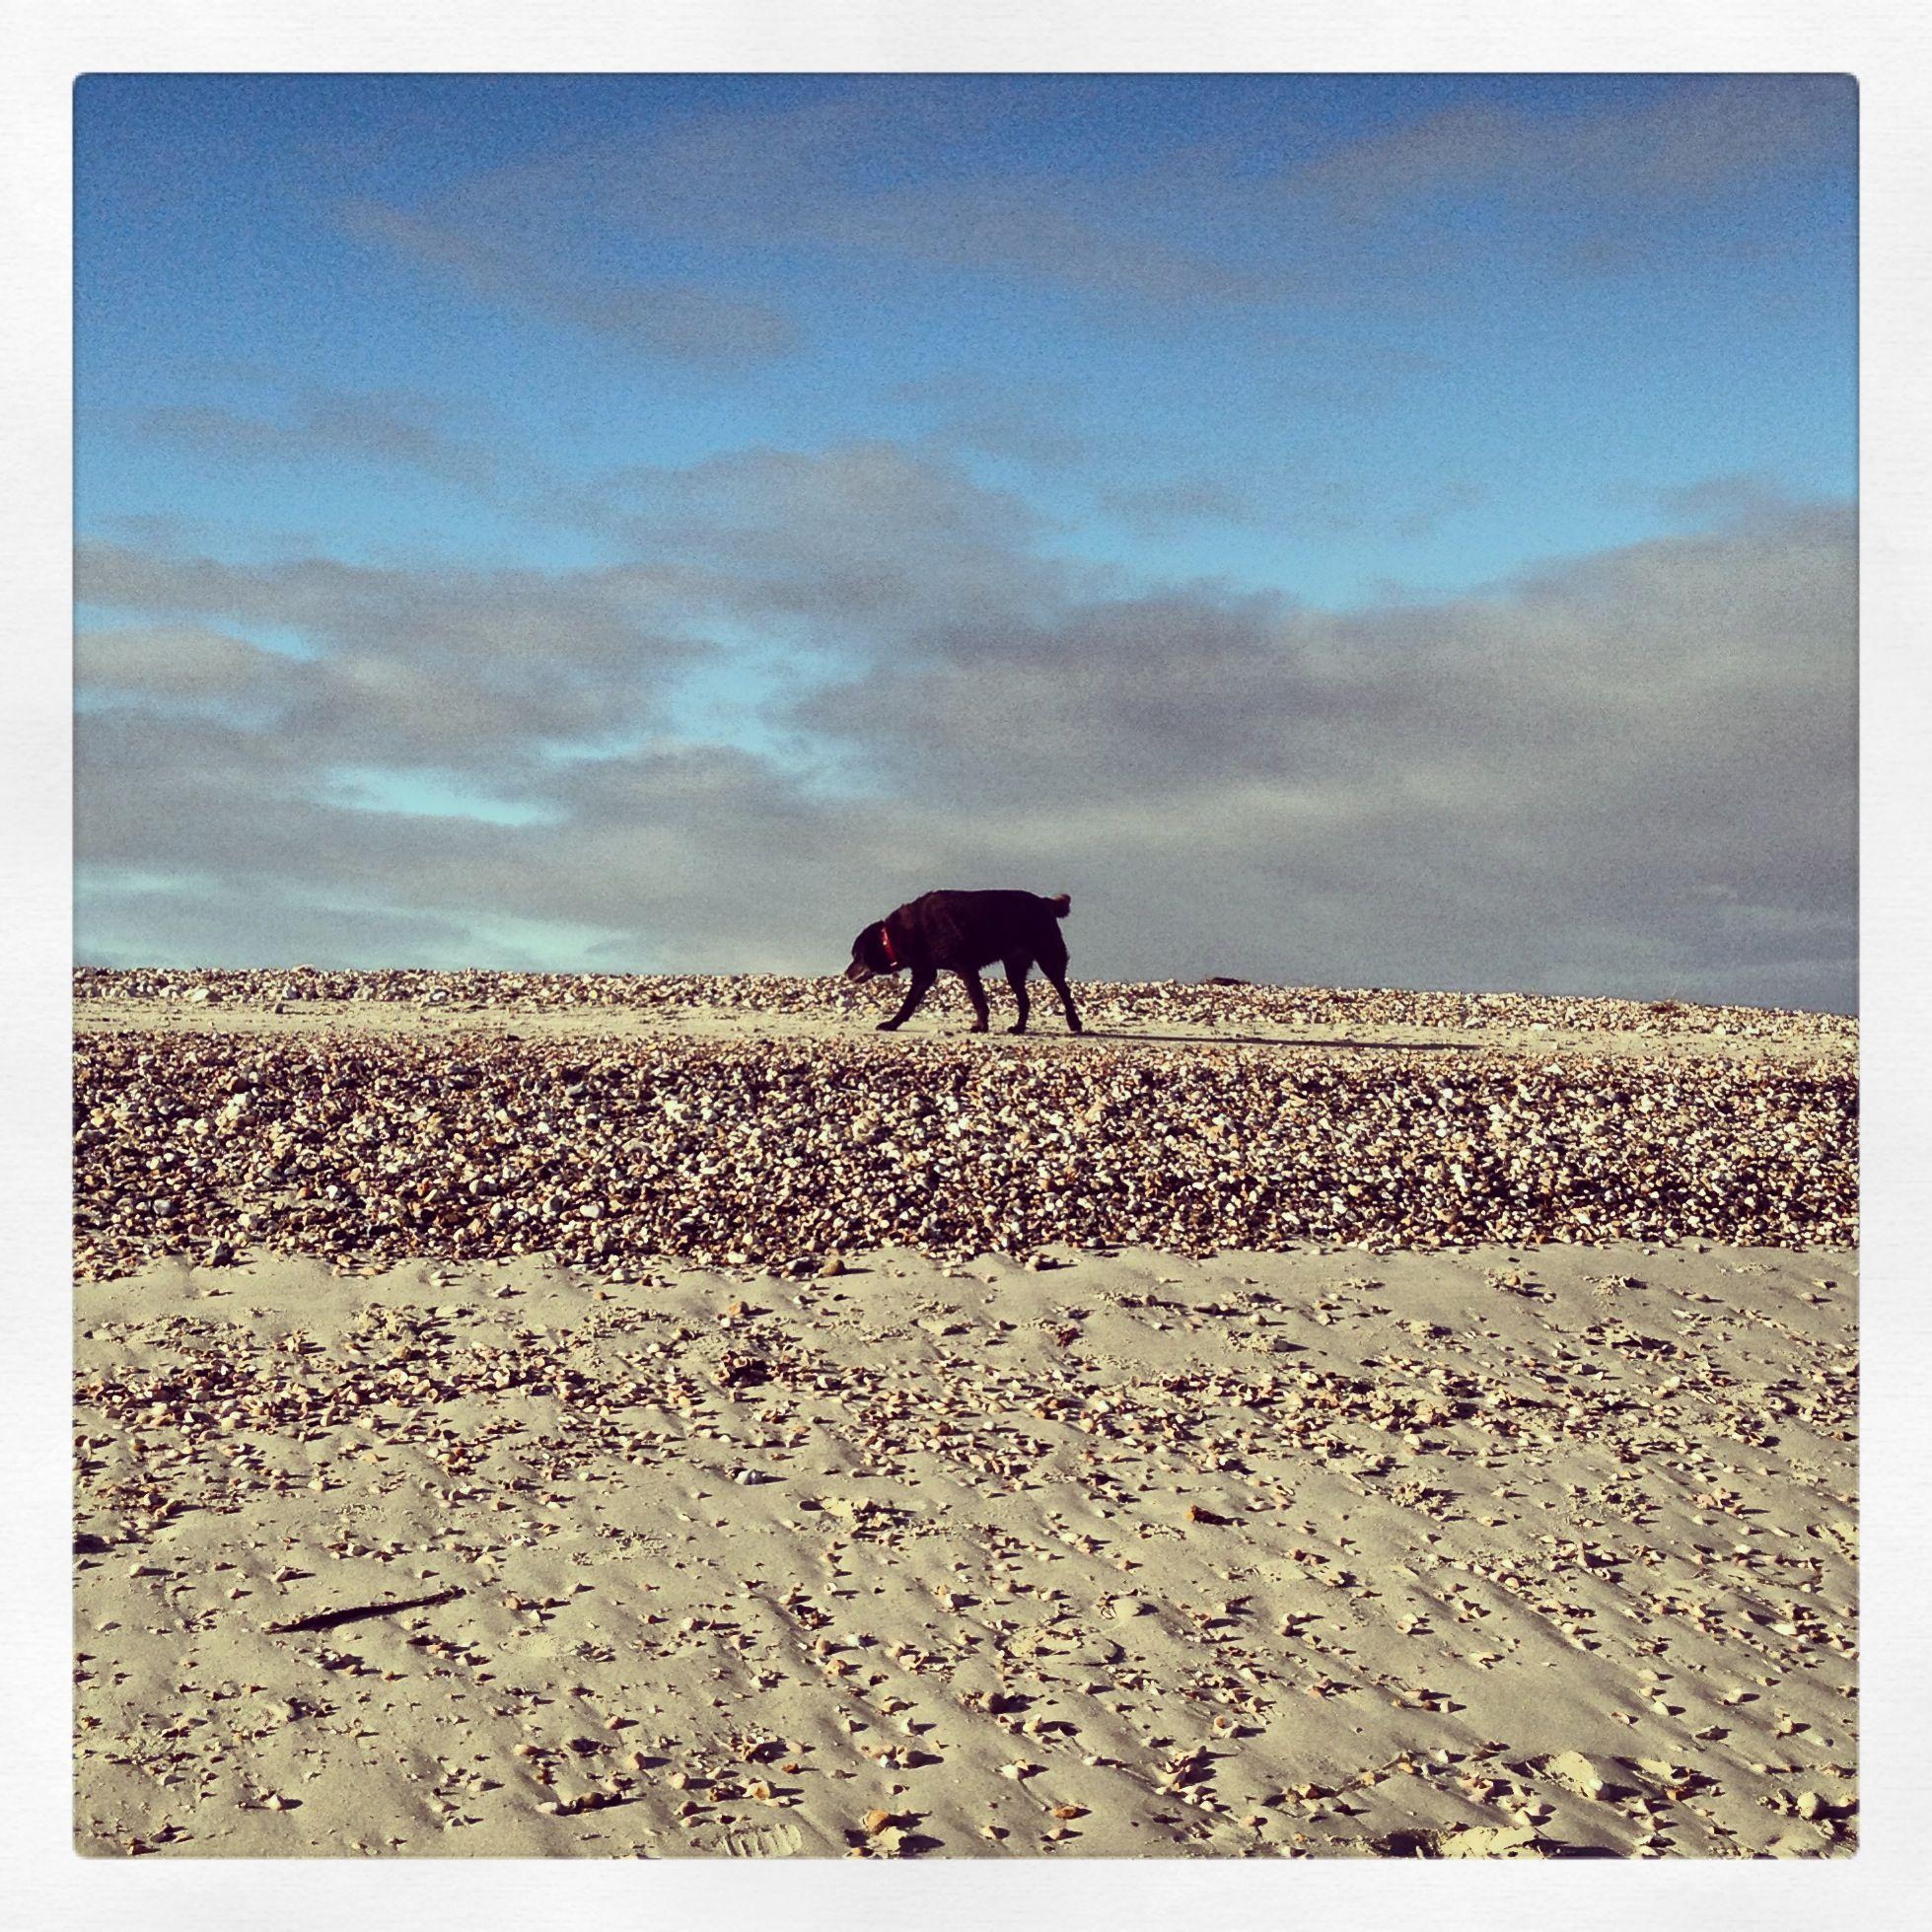 A little lone dog